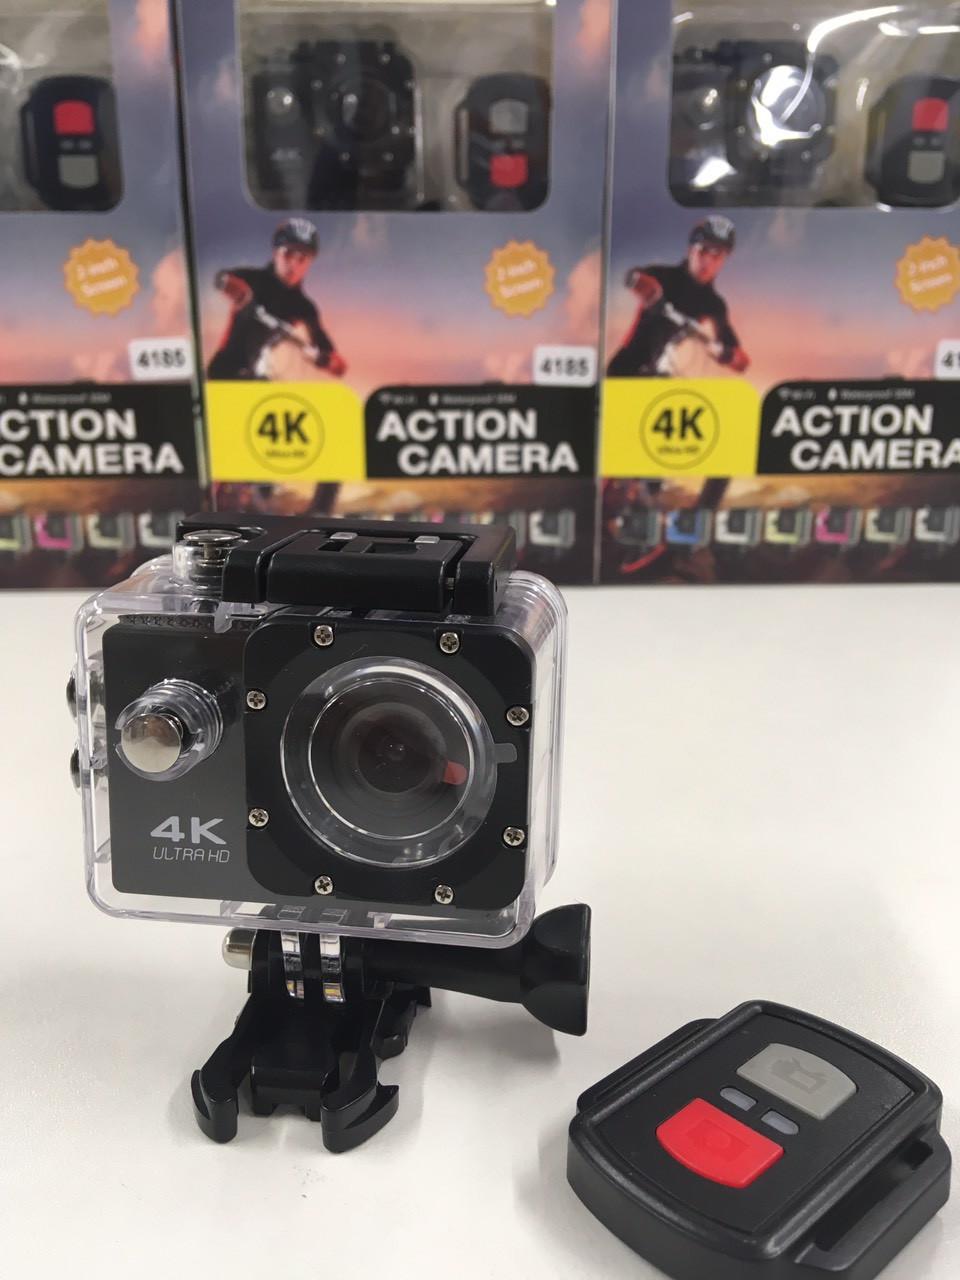 Видеокамера, Аction Camera DVR SPORT S3R, Wi-Fi, waterprof, 4K, с пультом д/у